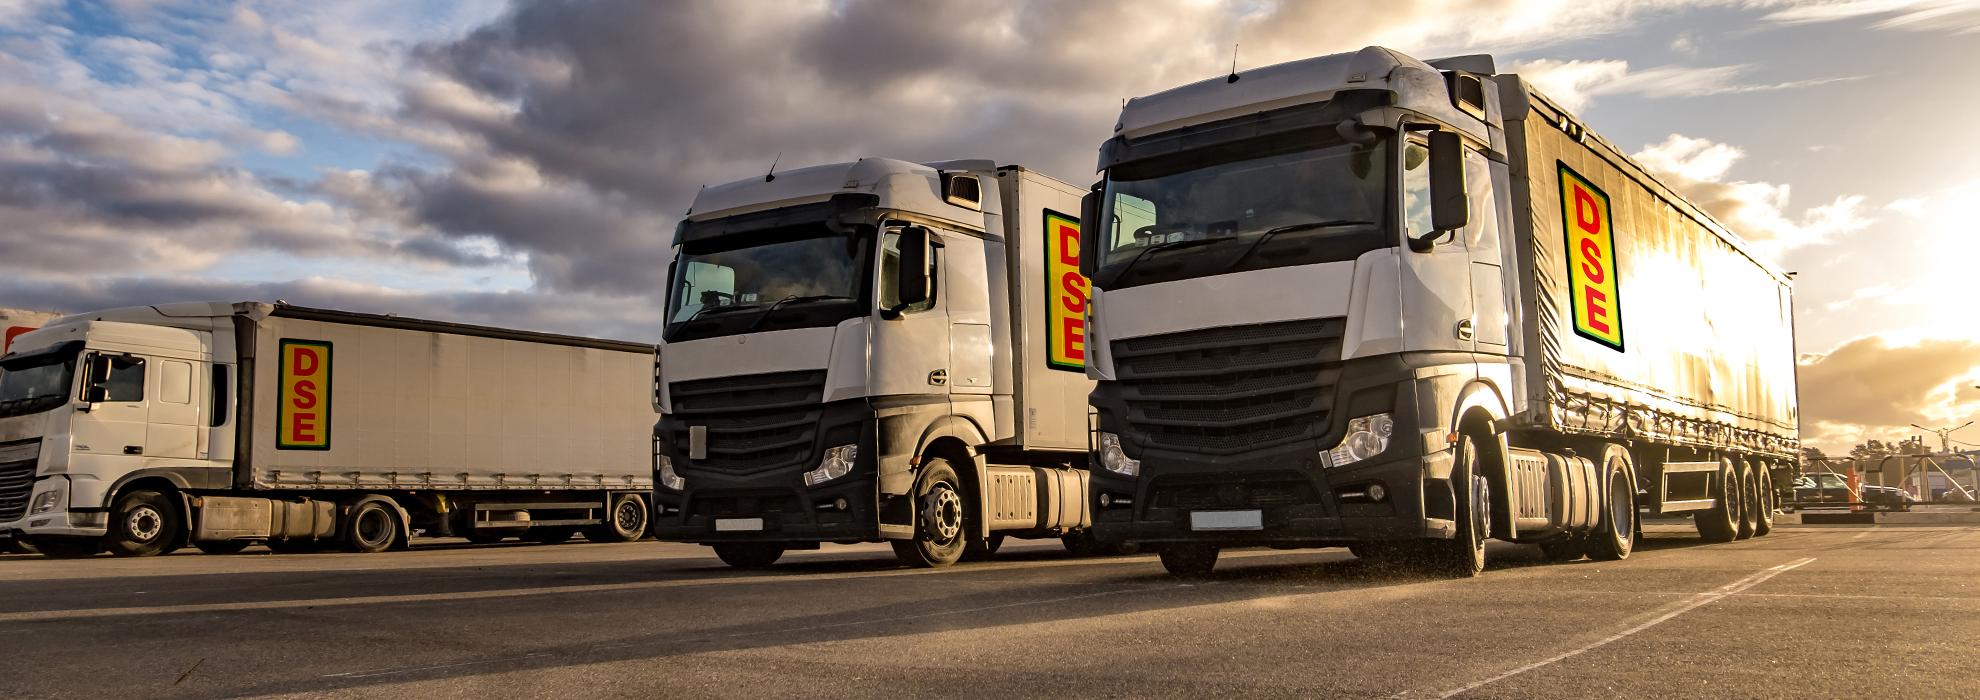 bulk transport sydney